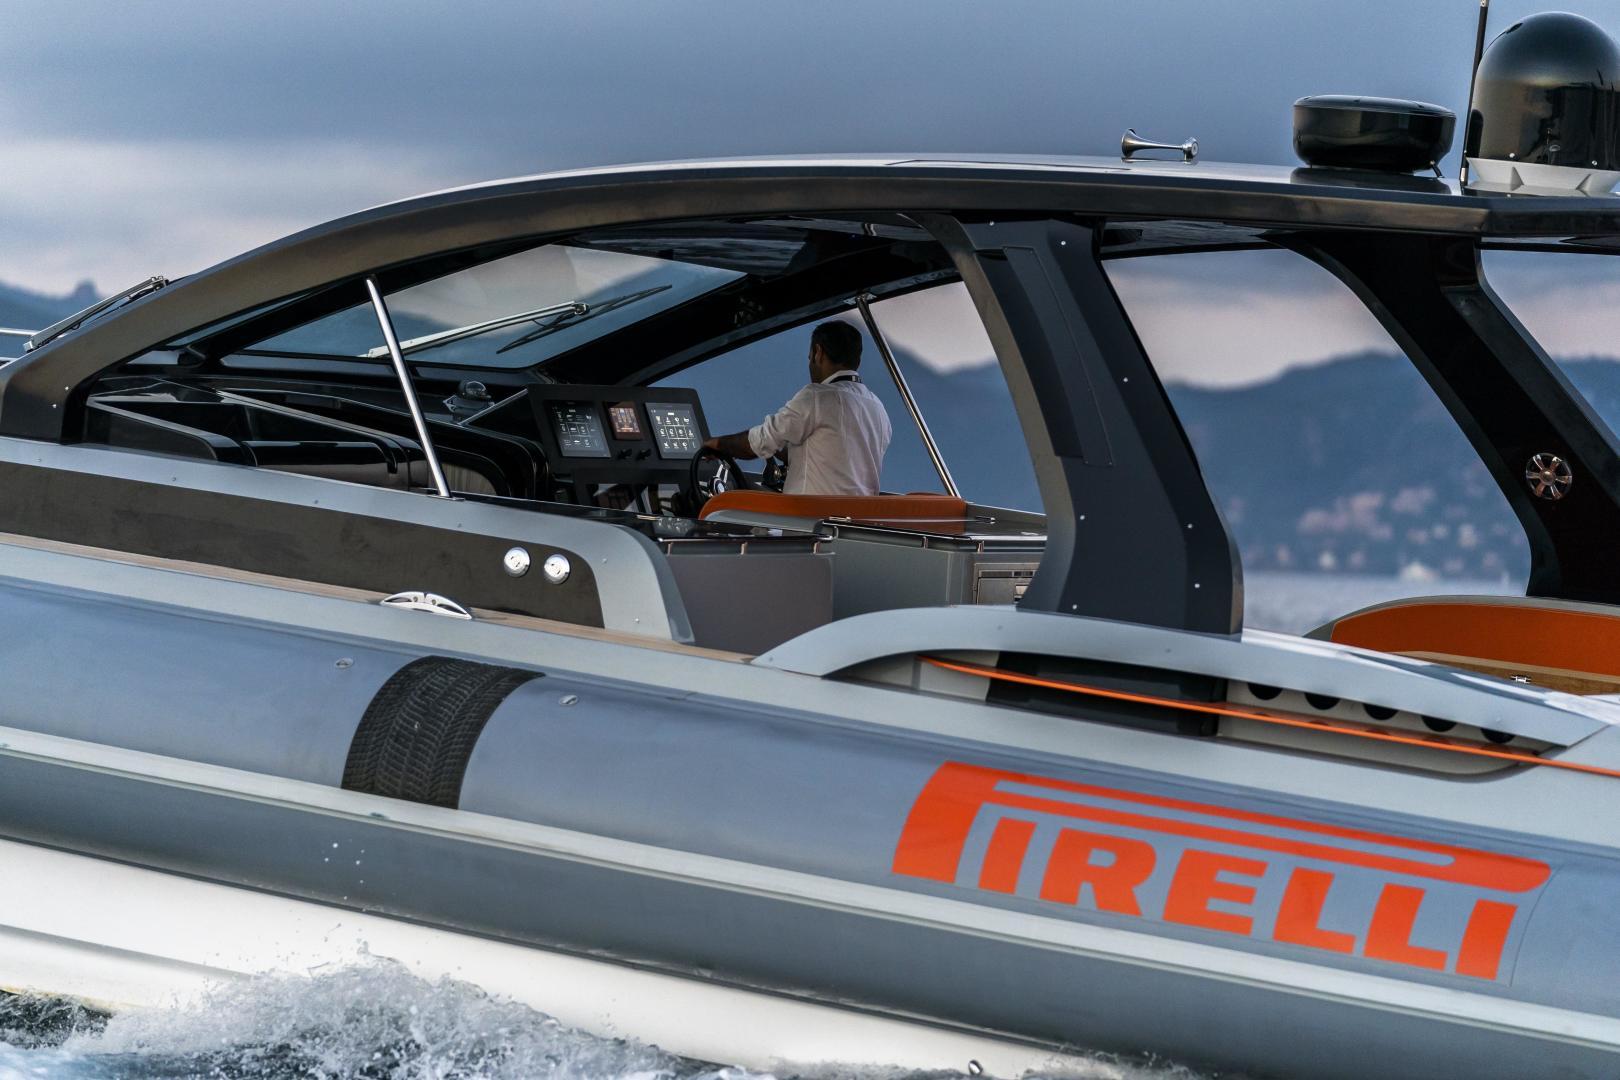 Pirelli-PZero 1900 2020-PZero 1900 Fort Lauderdale -Florida-United States-1549420 | Thumbnail